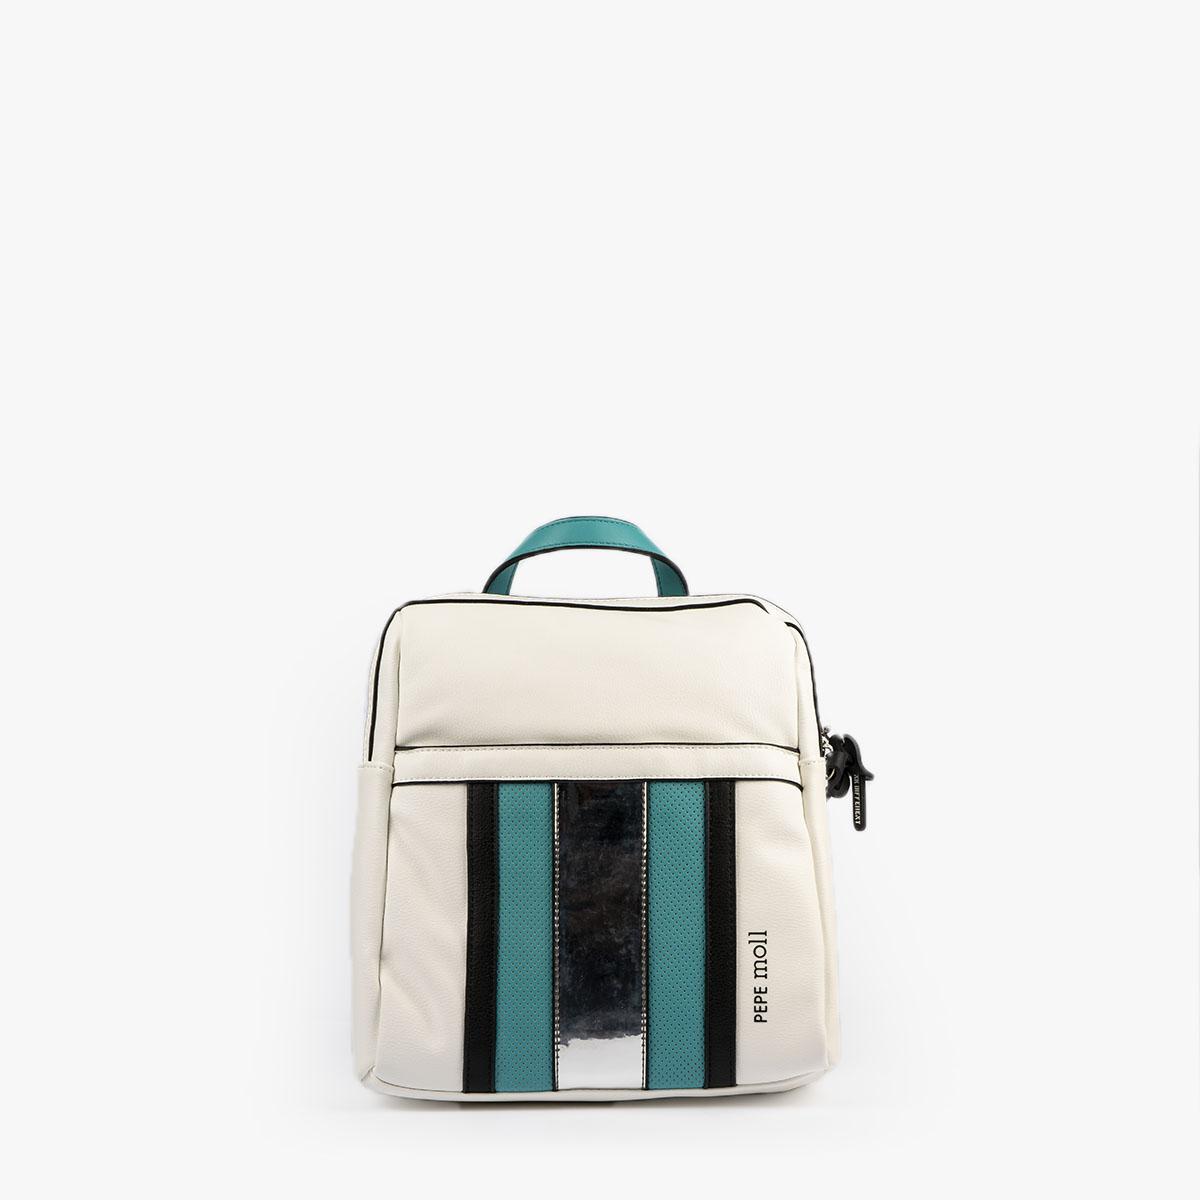 bolso mochila blanco y azul 34126 pepemoll